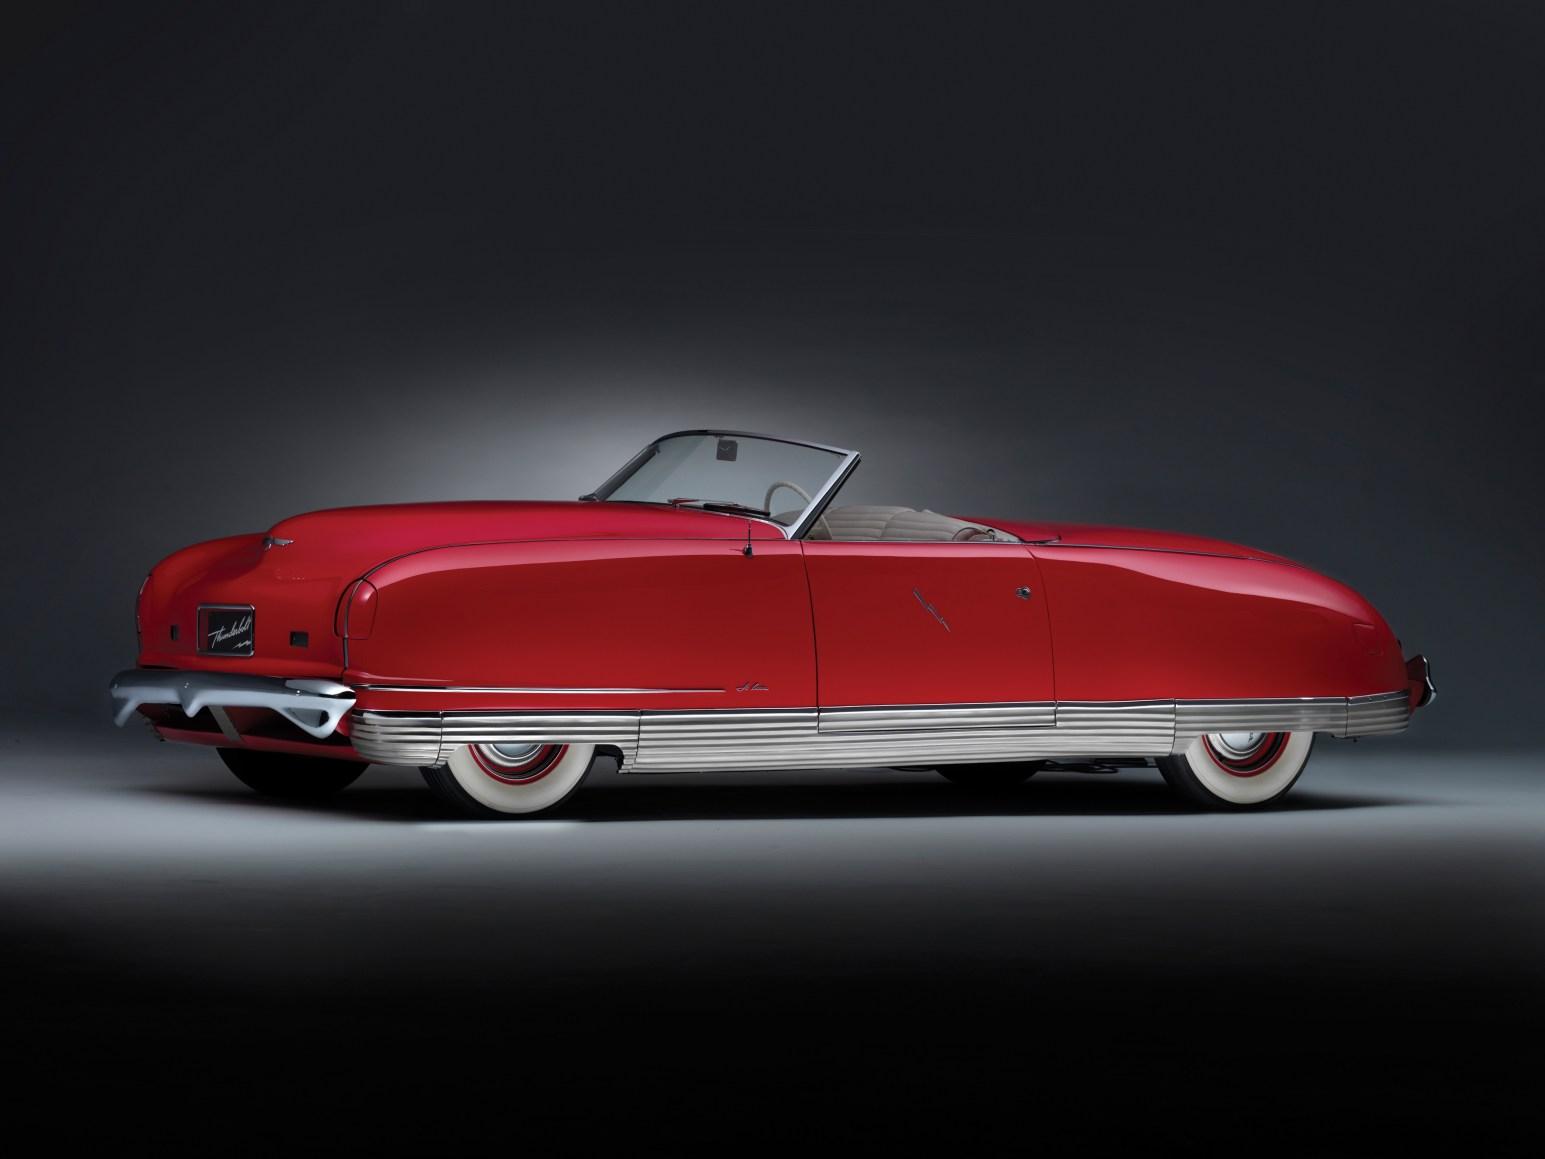 chrysler thunderbolt concept car 1940 uc